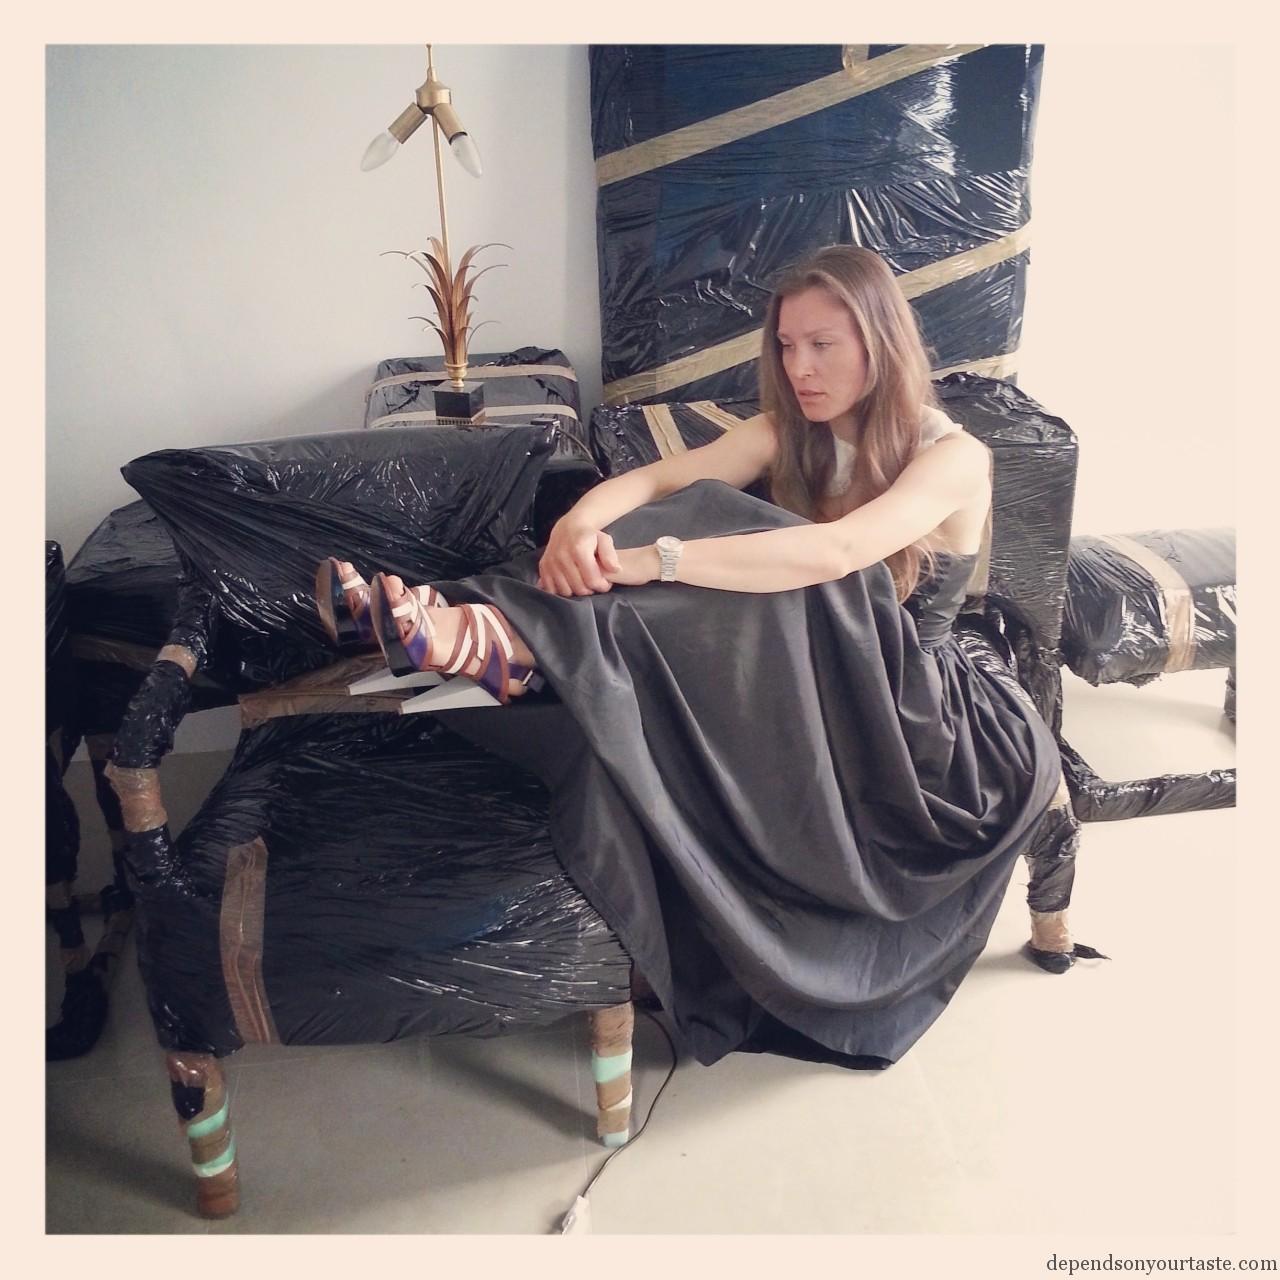 marni sandals, vintage black long dress, palm table lamp ,packing , moving